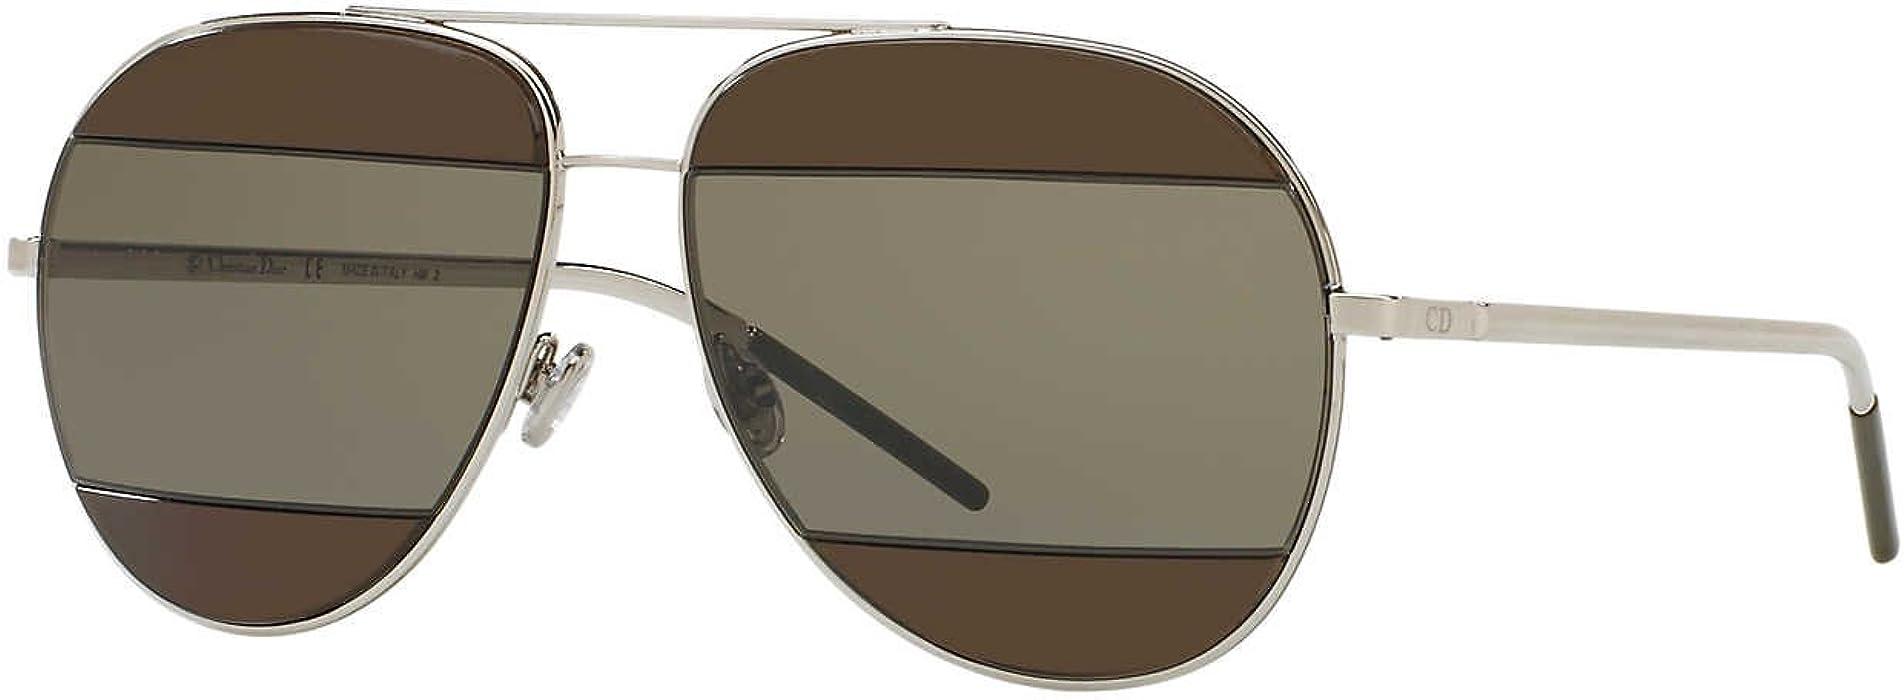 2232f89b5168 Dior Dior Spilt2 0106J3 Palladium Spilt 2 Aviator Sunglasses. Back. Double- tap to zoom